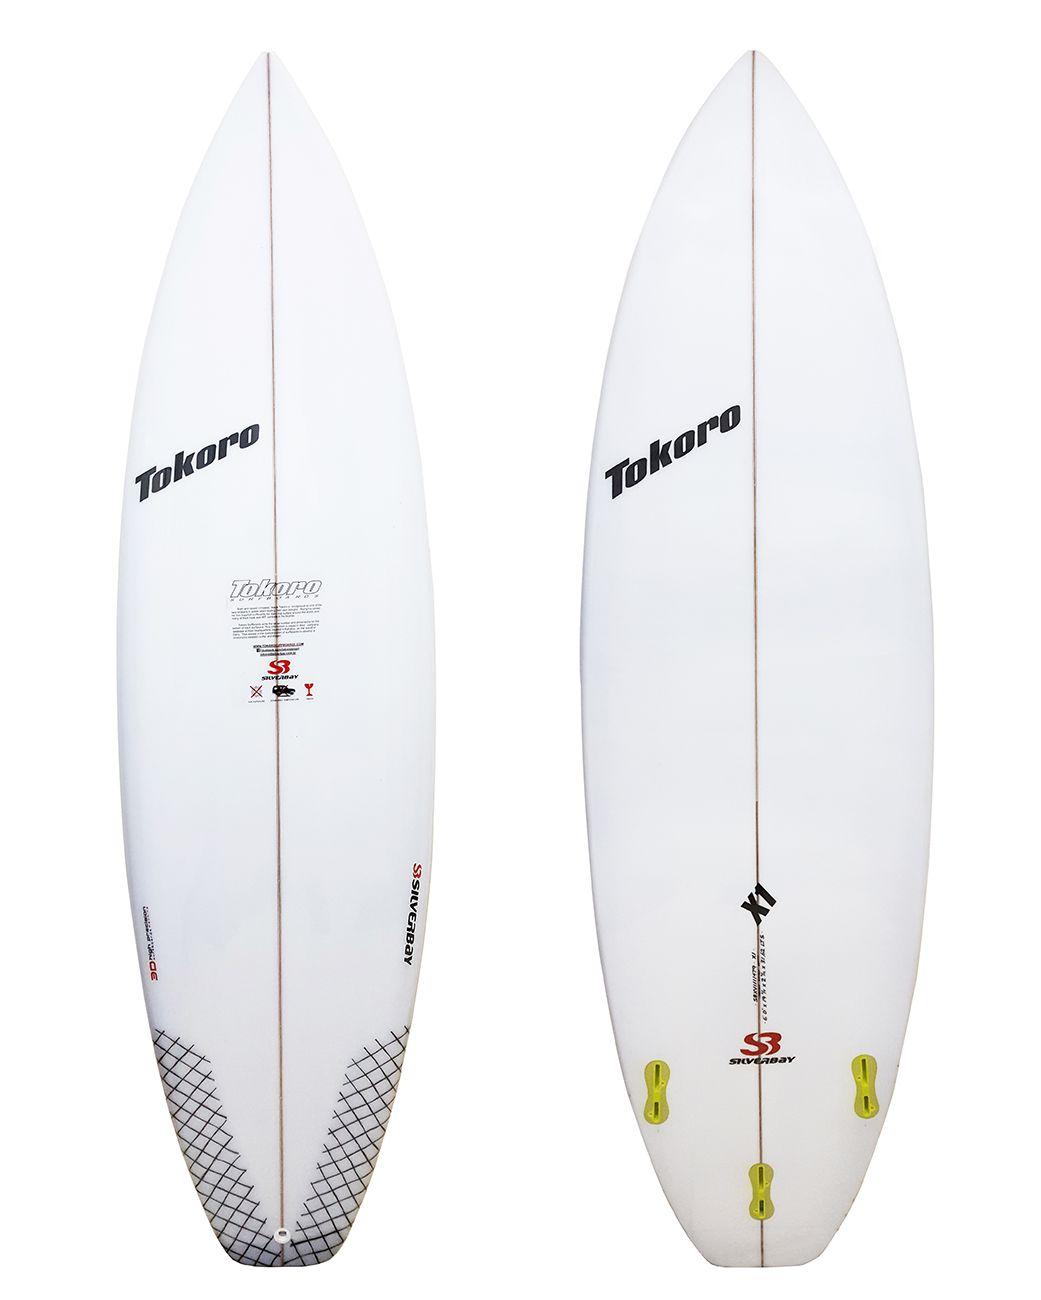 Tokoro 6'0'' X1 FCS II